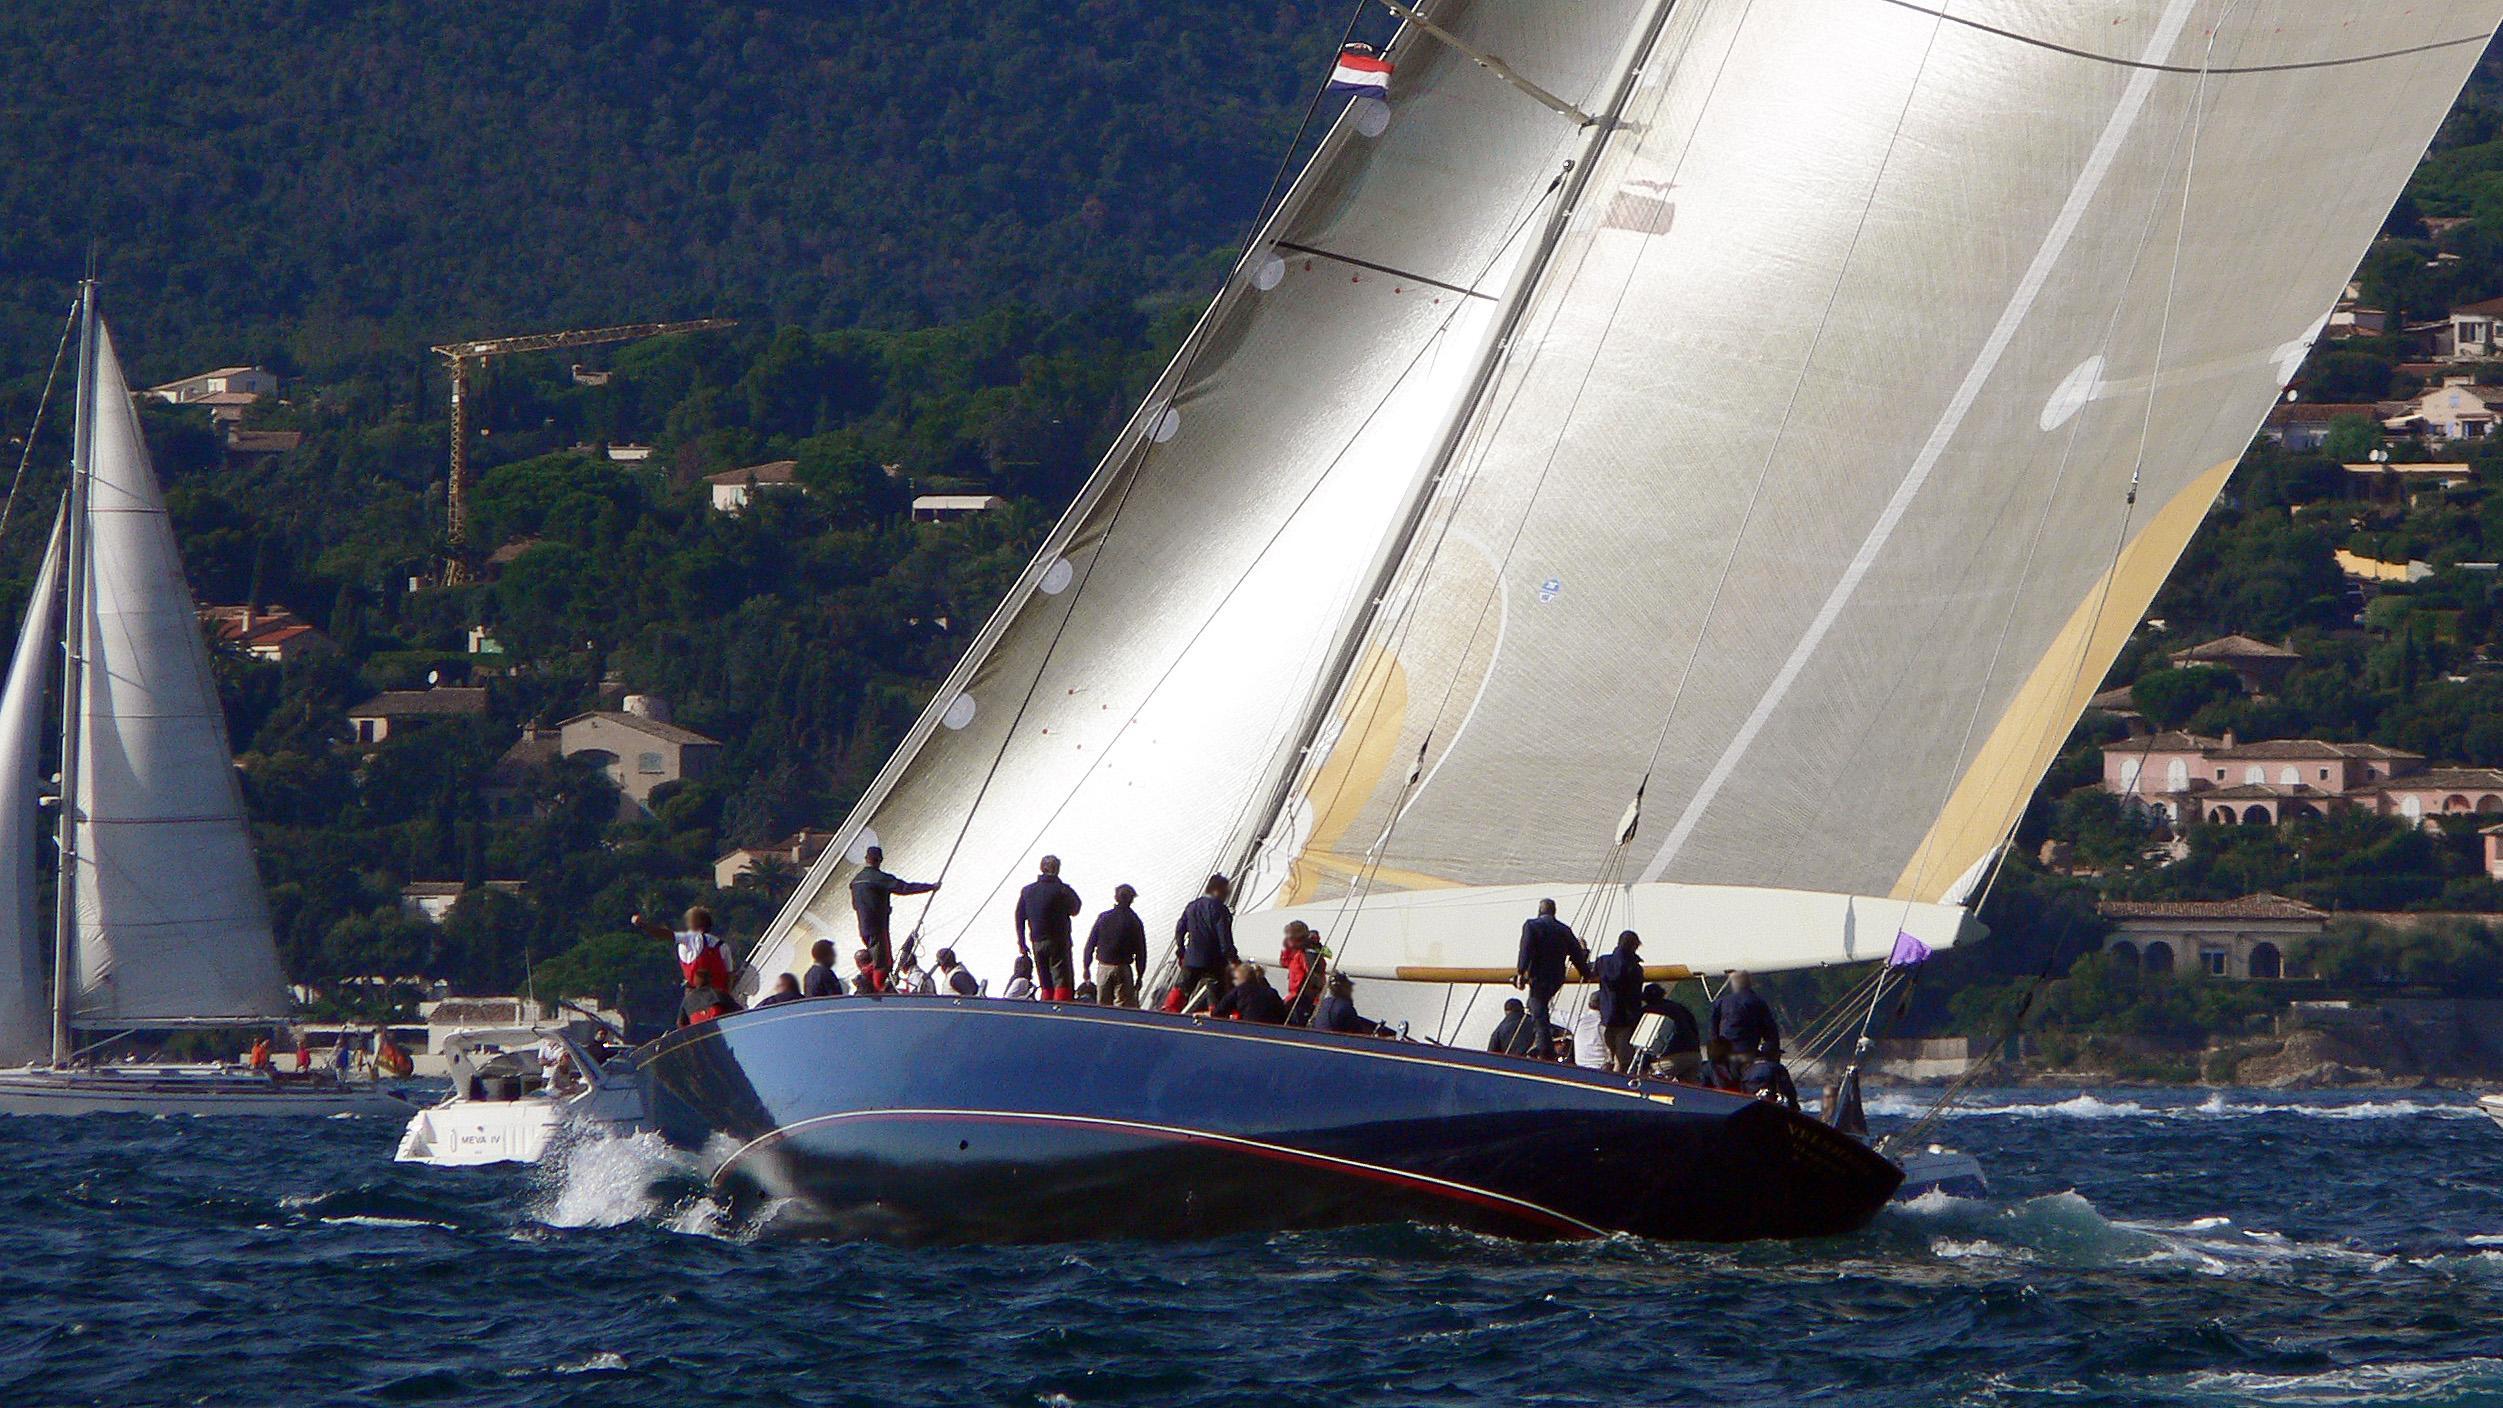 velsheda-sailing-yacht-camper-nicholsons-1933-38m-cruising-stern